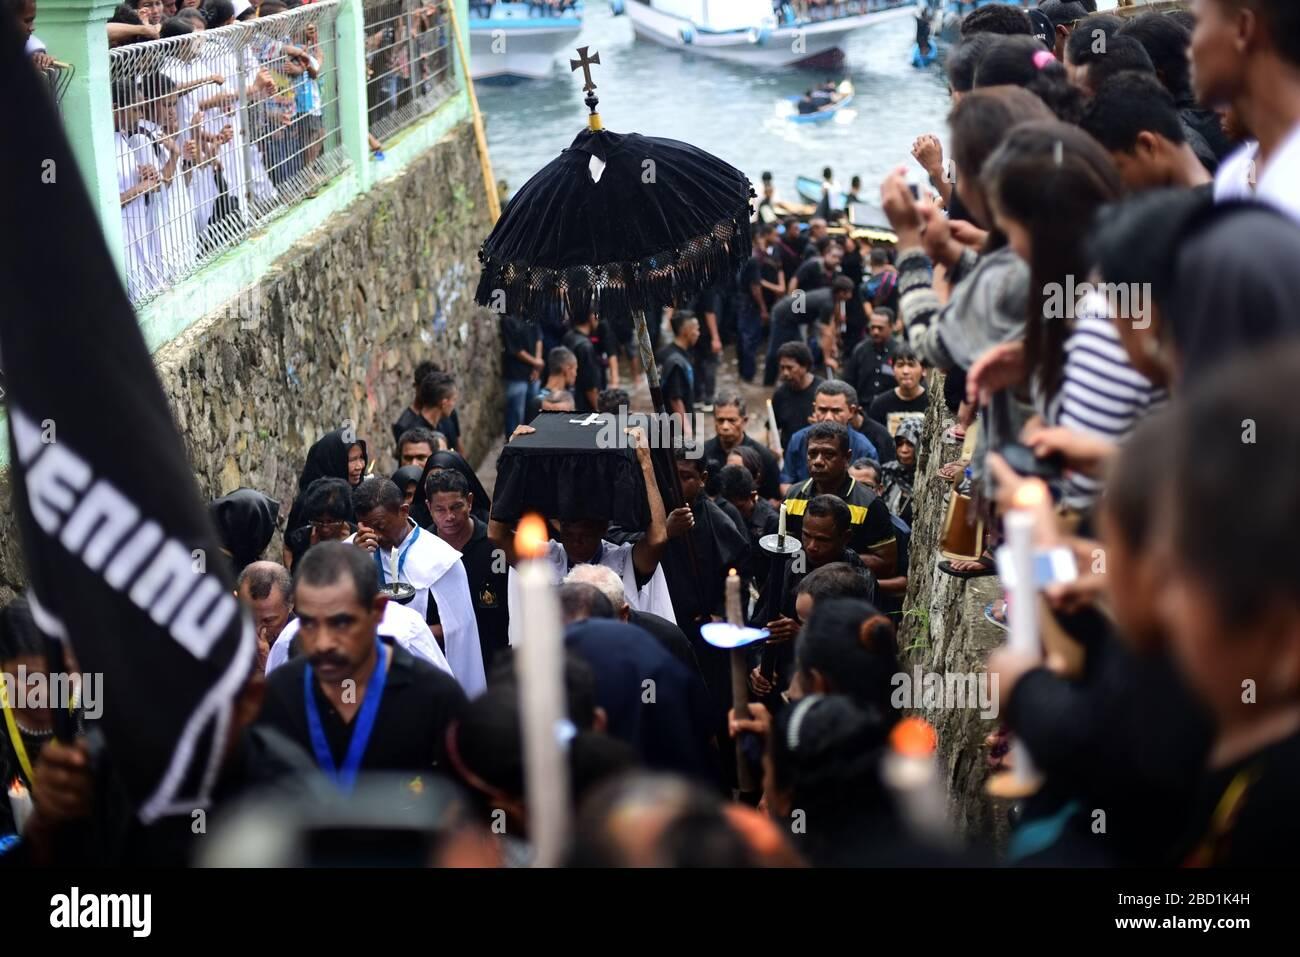 Semana Santa (Holy Week) procession in Larantuka, Flores Island, Indonesia. Stock Photo